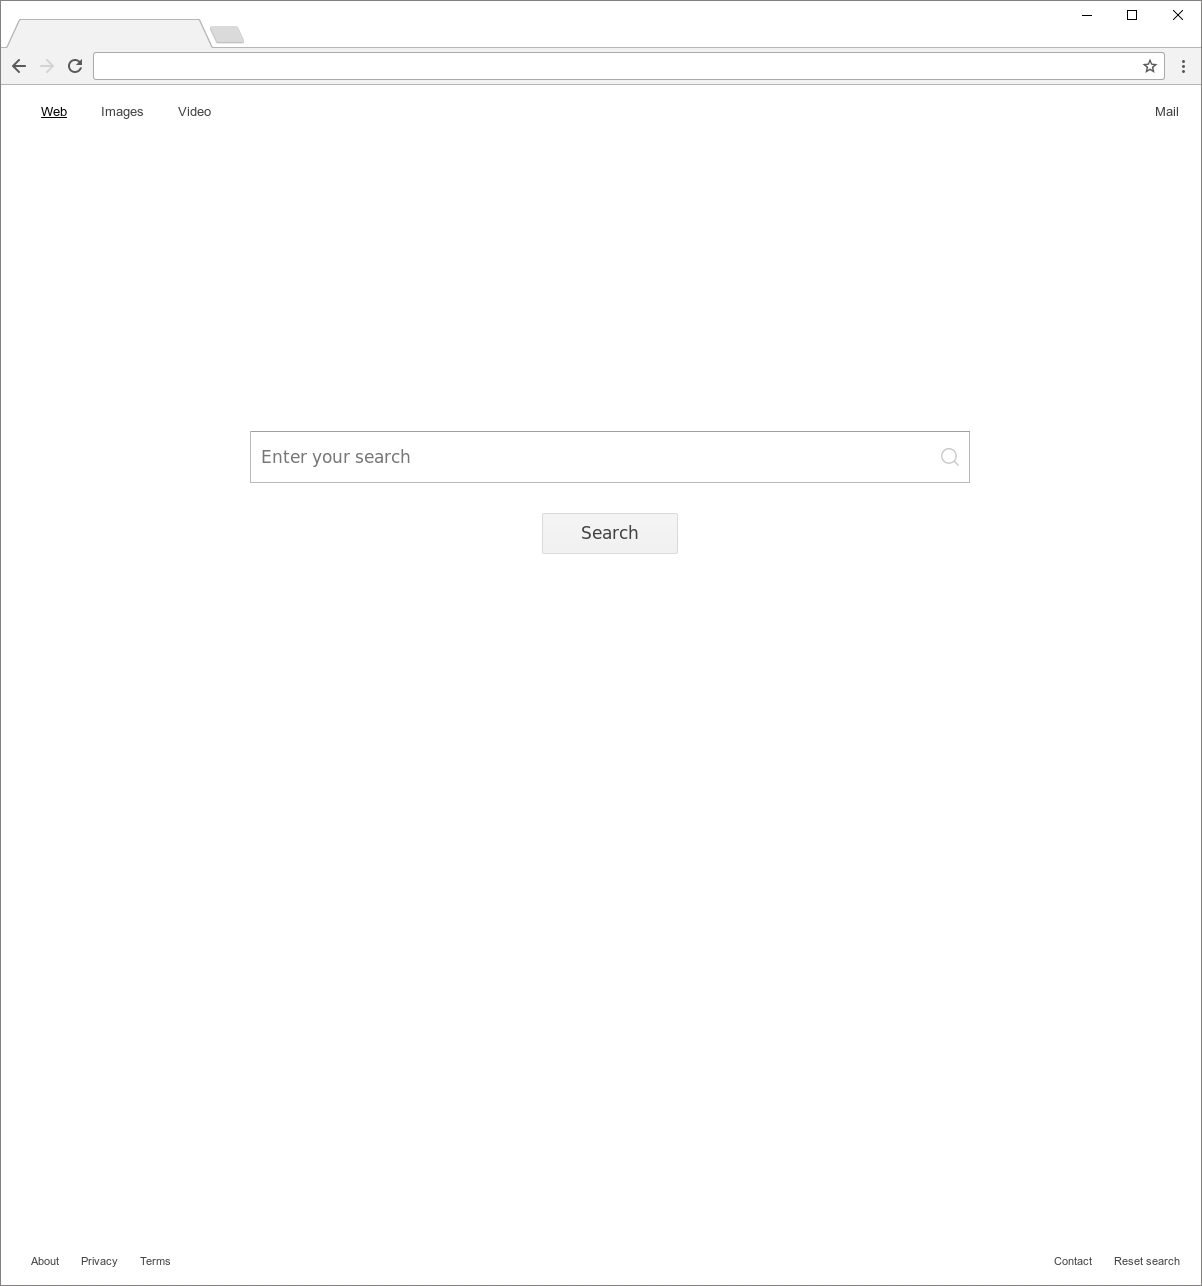 Go.deepteep.com Hijacker